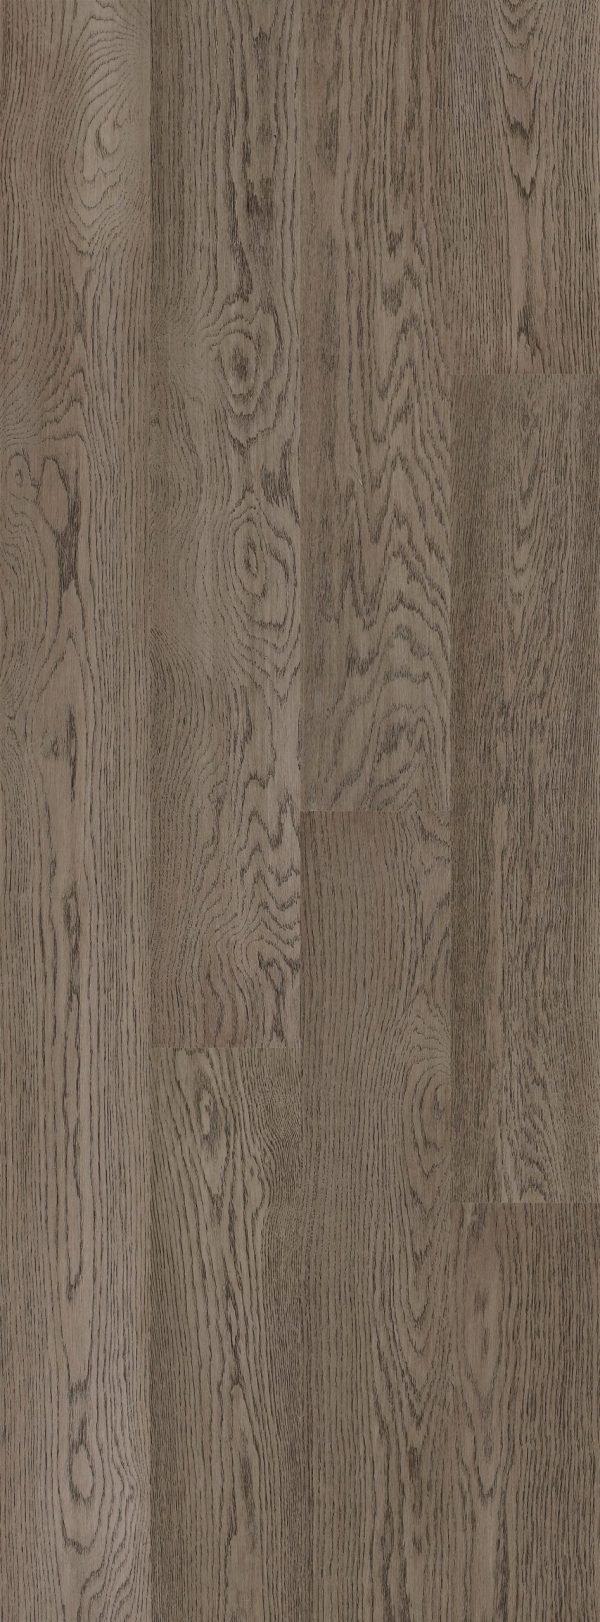 European Oak - Engineered Hardwood - Wire Brushed - CF1021727